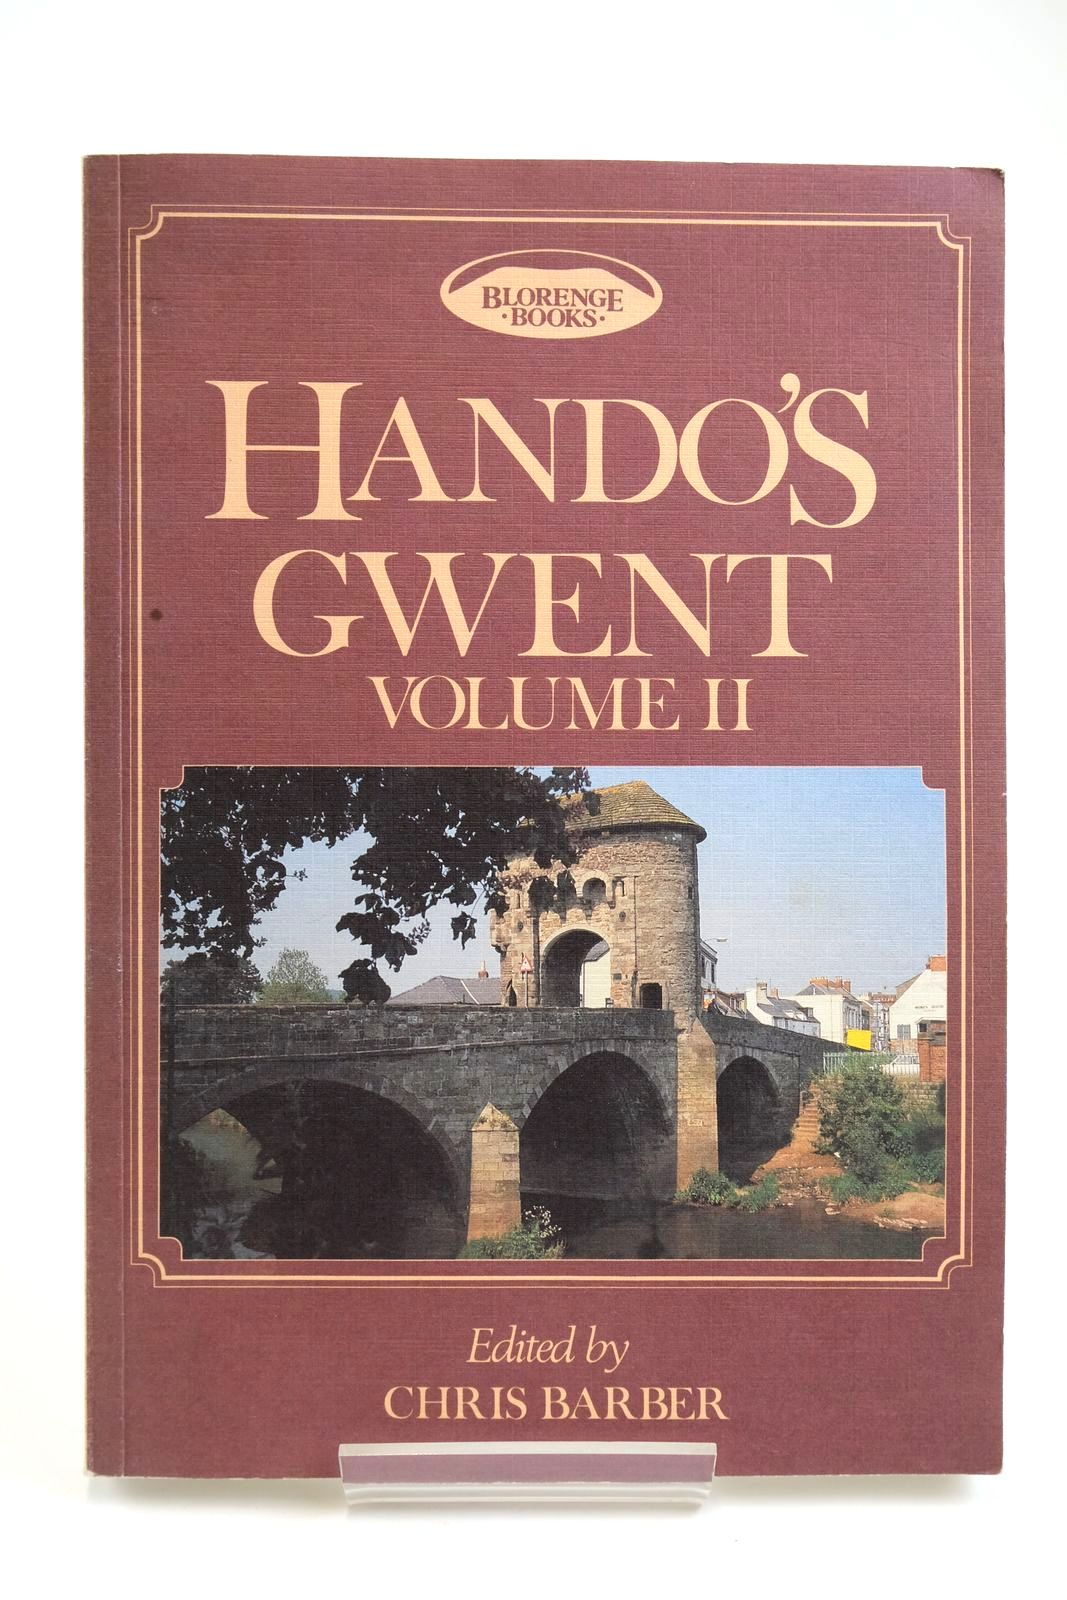 Photo of HANDO'S GWENT VOLUME II- Stock Number: 2133560